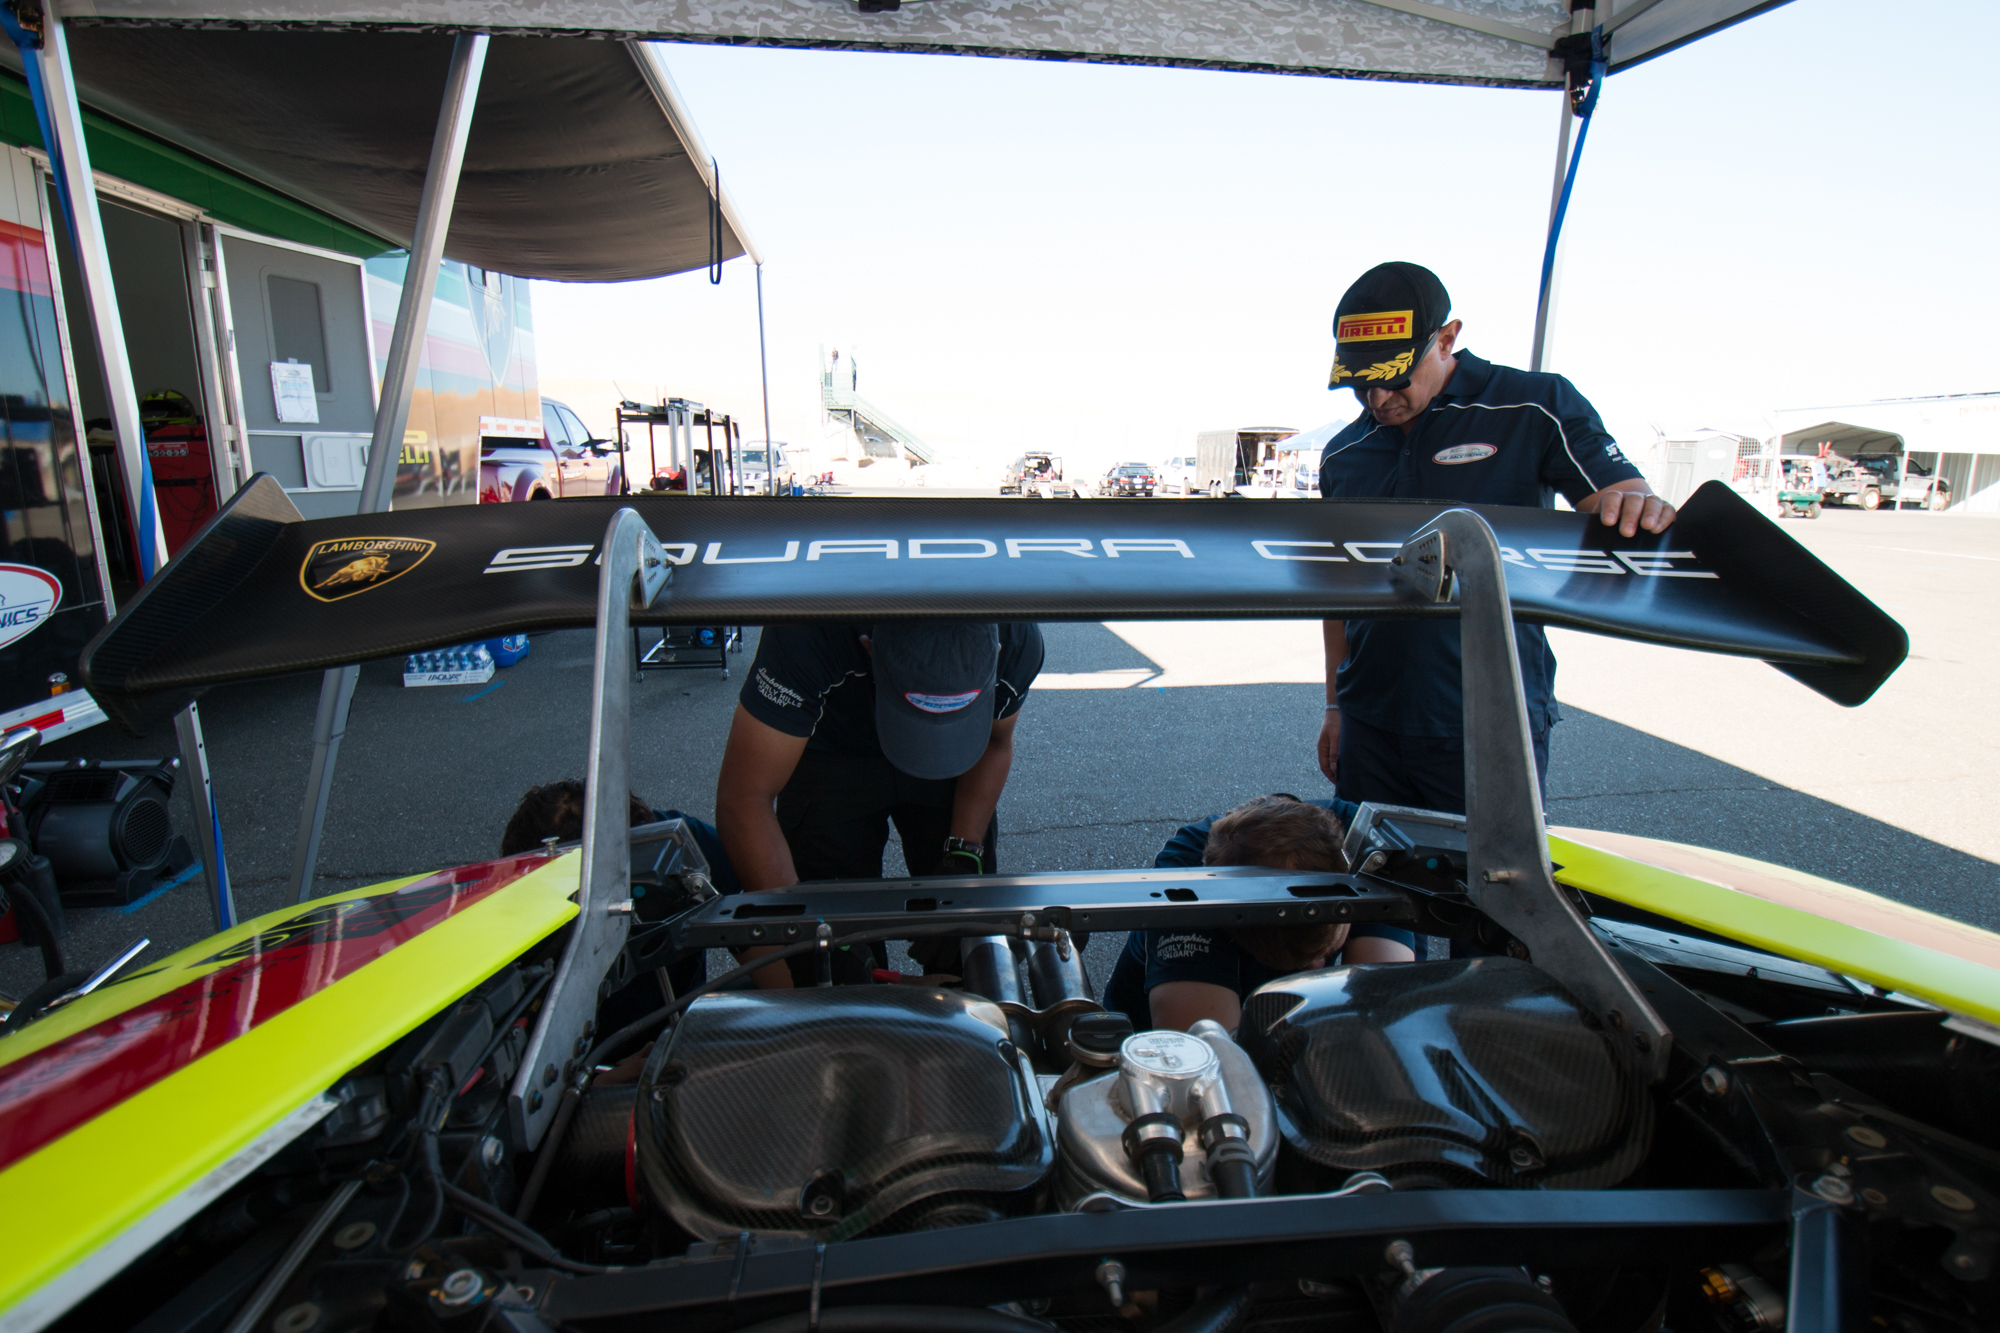 Steven-Racing-20130204-44738.jpg